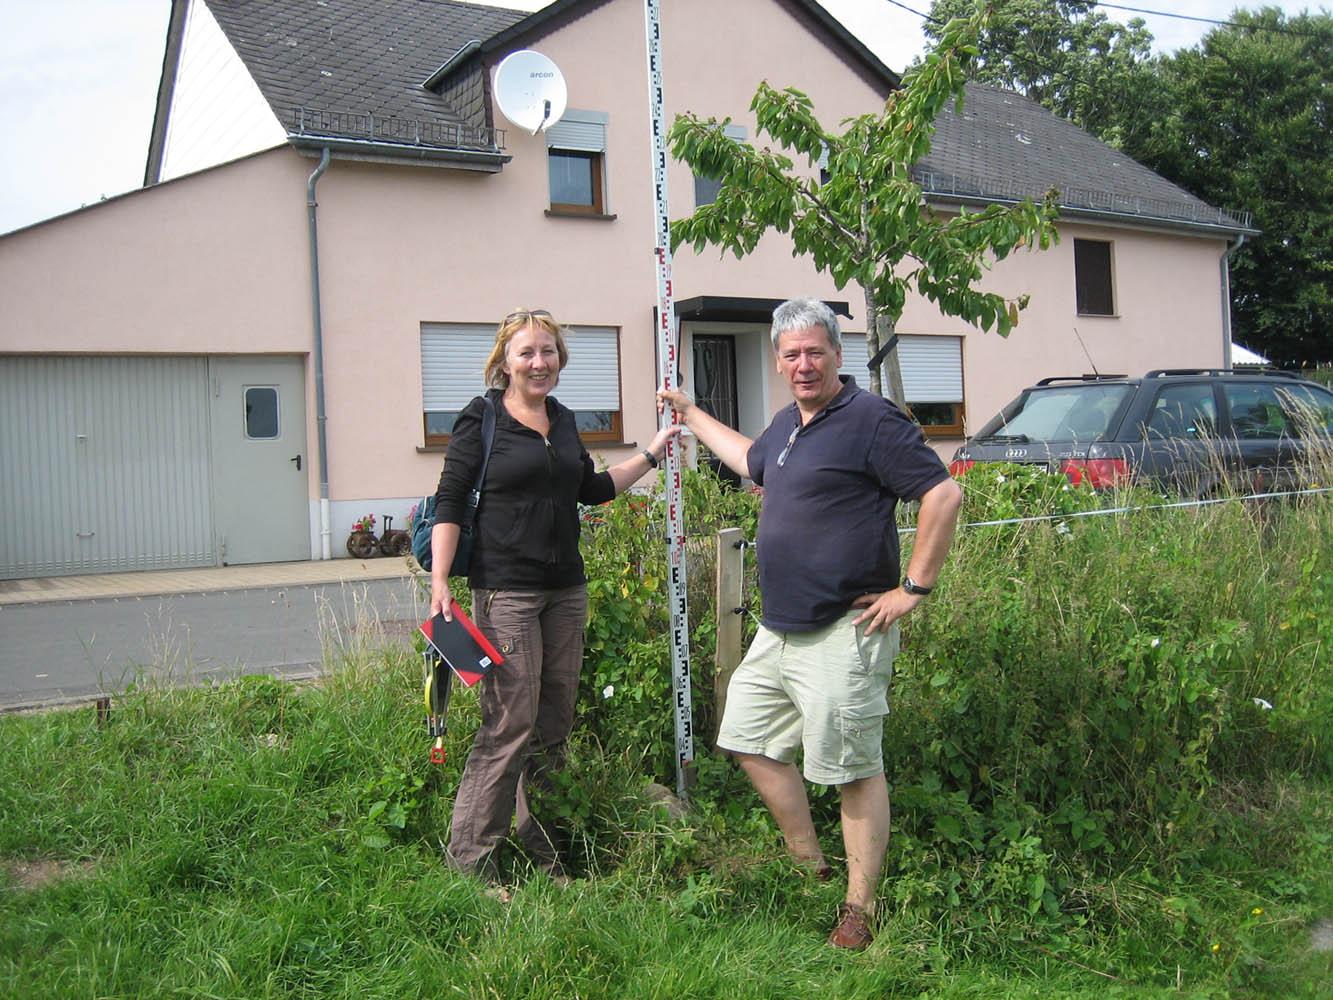 Alex en marjon: 2010 ons huis ontwerp & 2011 bouwvergunning